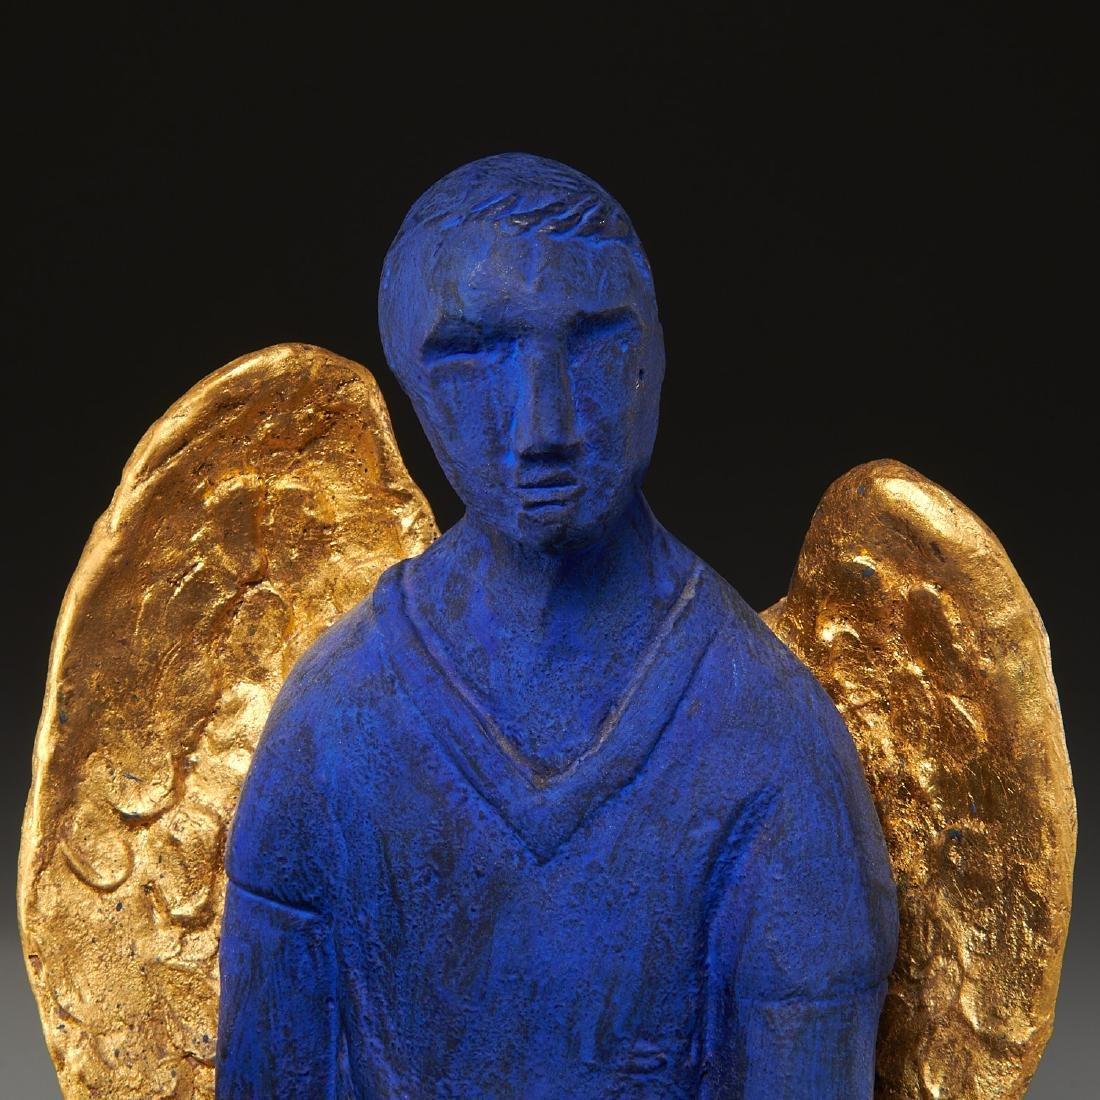 Sandro Chia, sculpture - 2